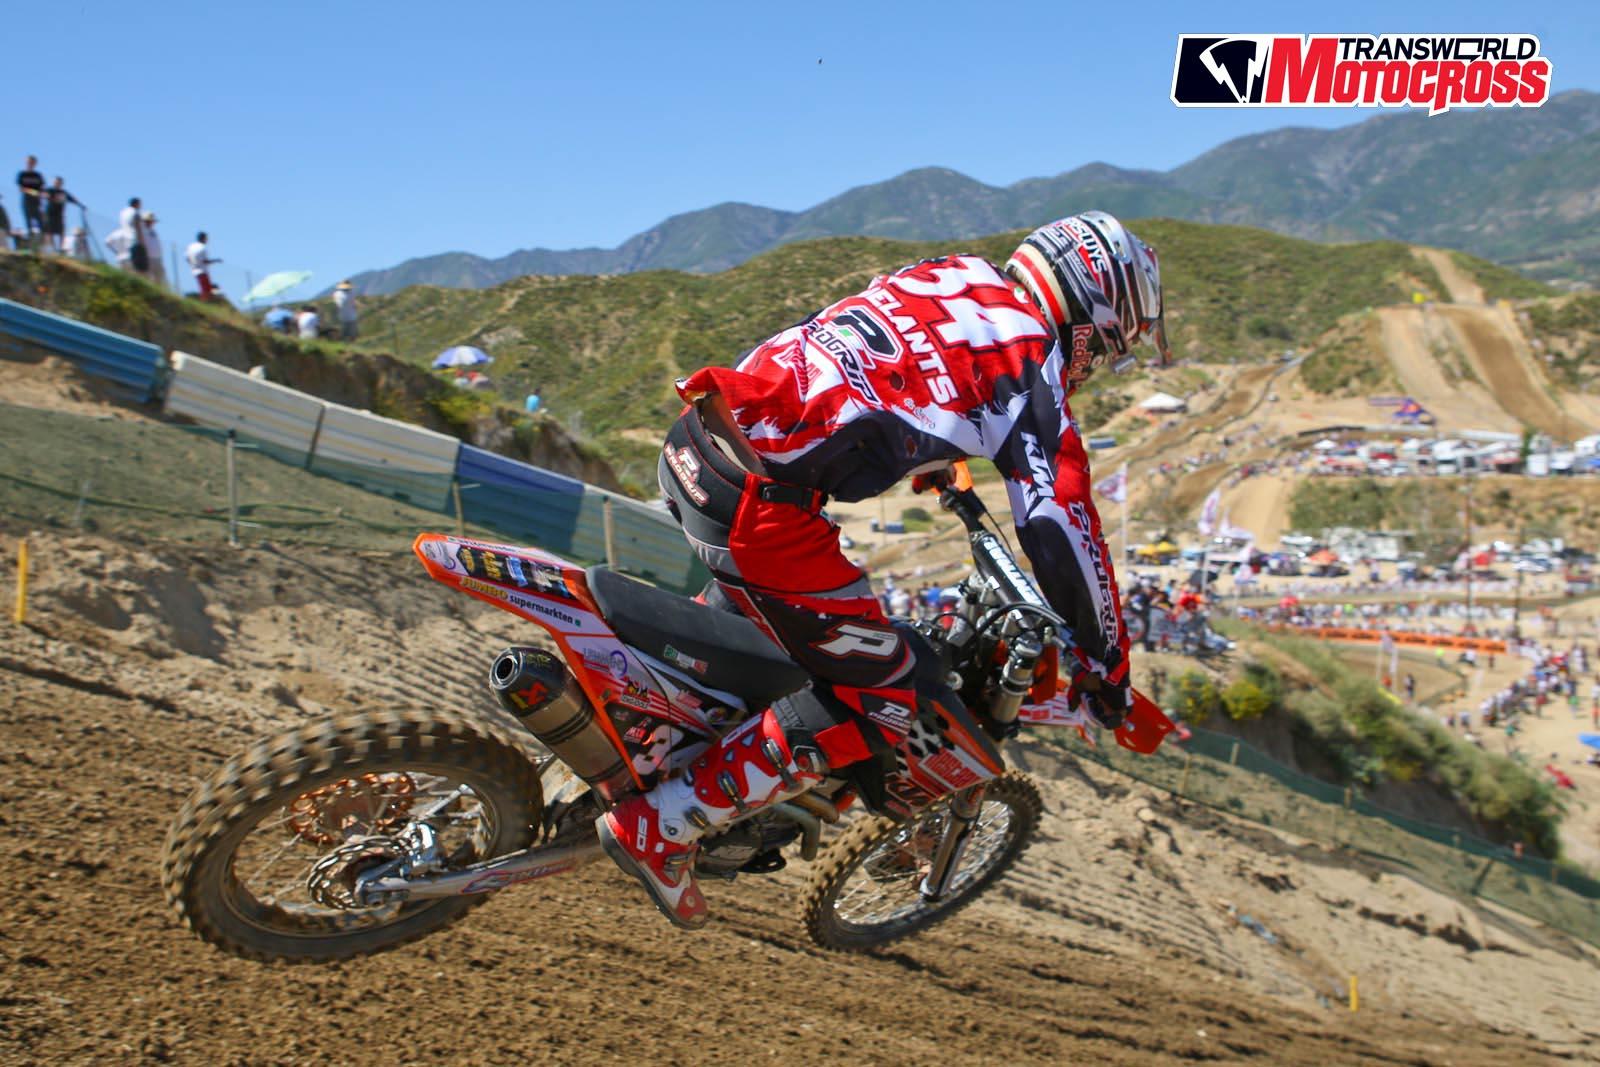 Wednesday Wallpapers II Transworld Motocross 1600x1067